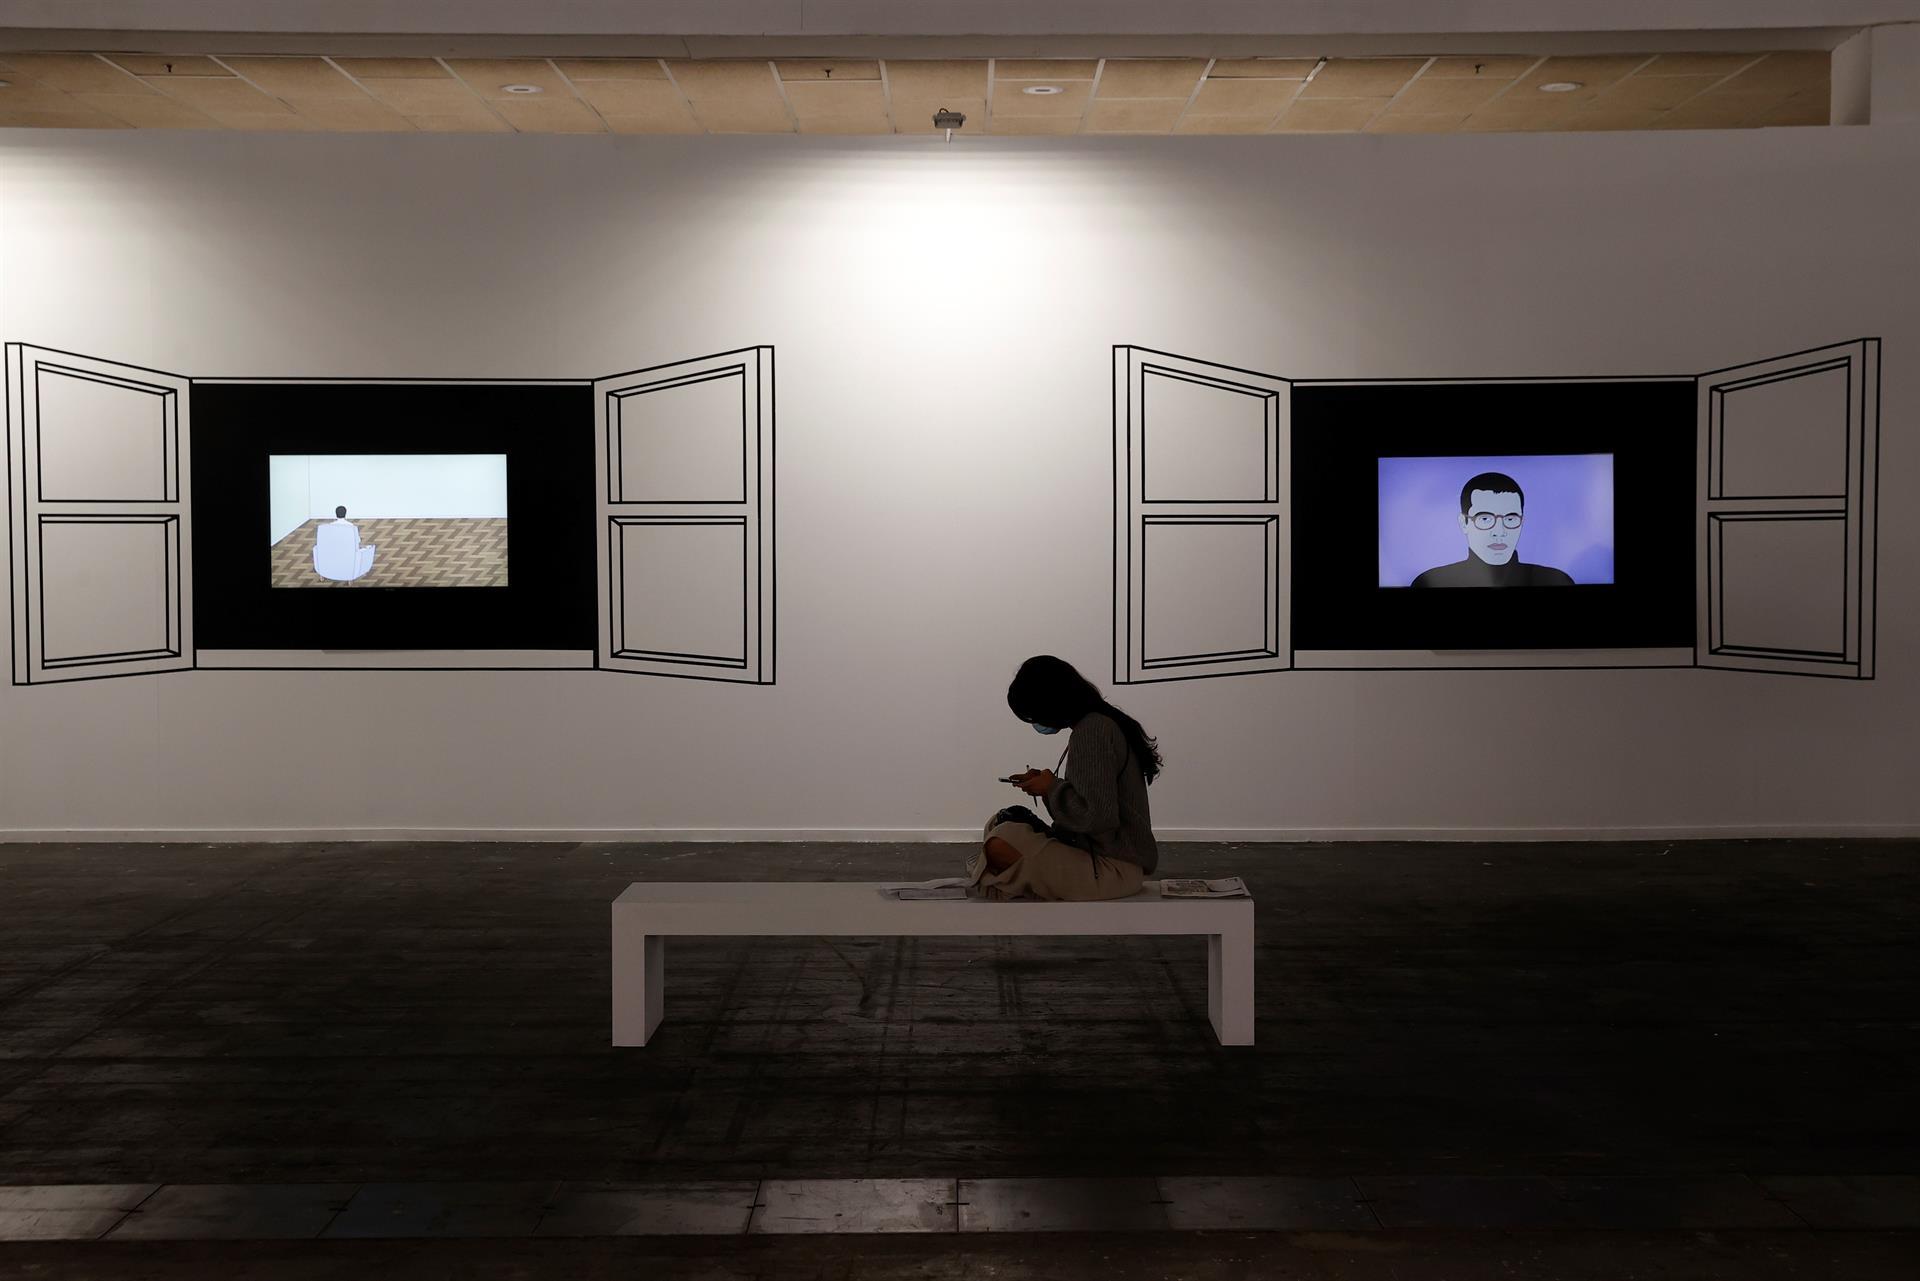 Feria de arte ARCO en Madrid